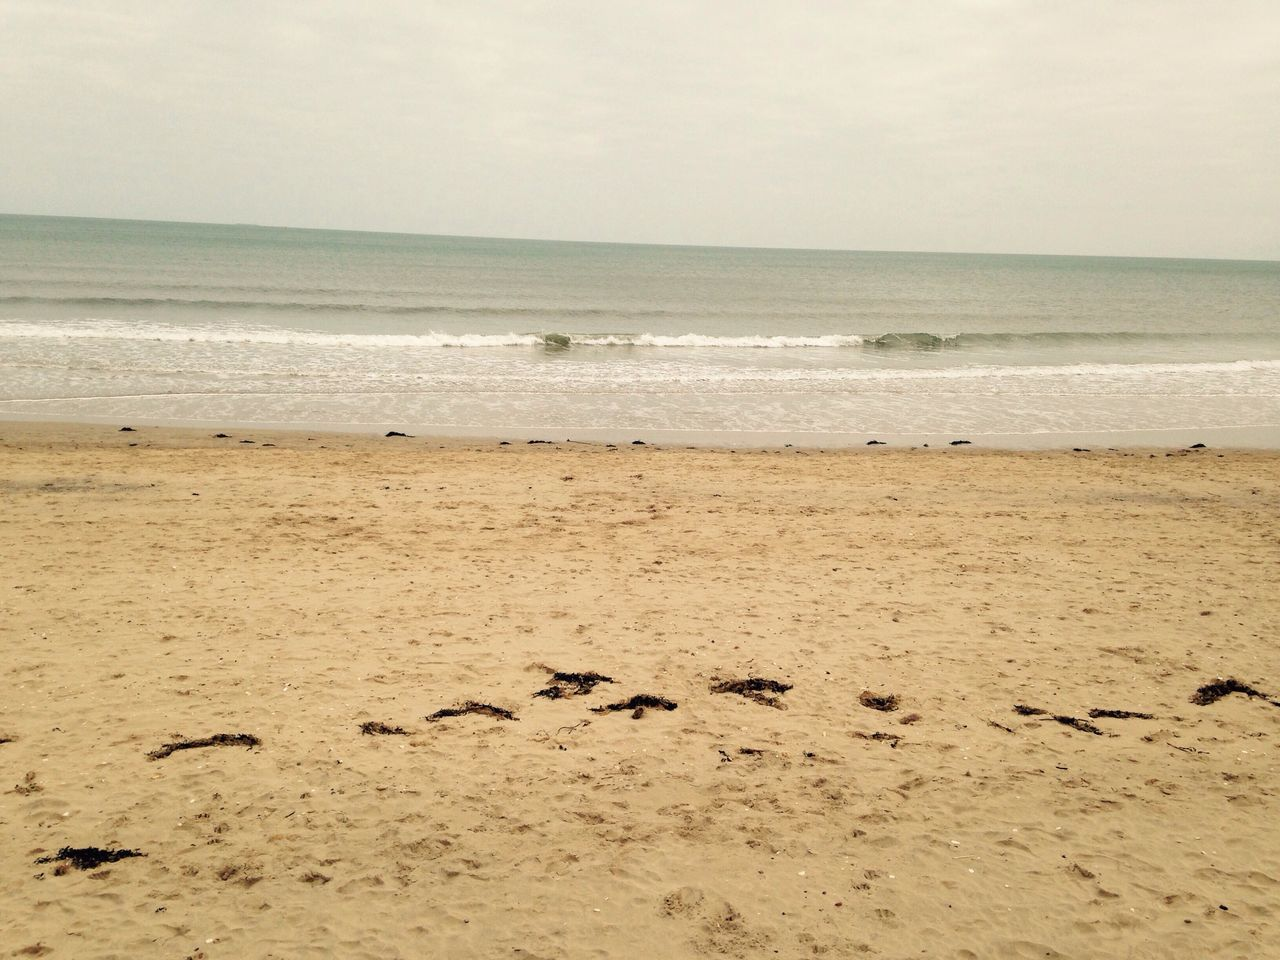 Beach Barmston Barmston Beach Coast Walking On The Beack Beach Walks